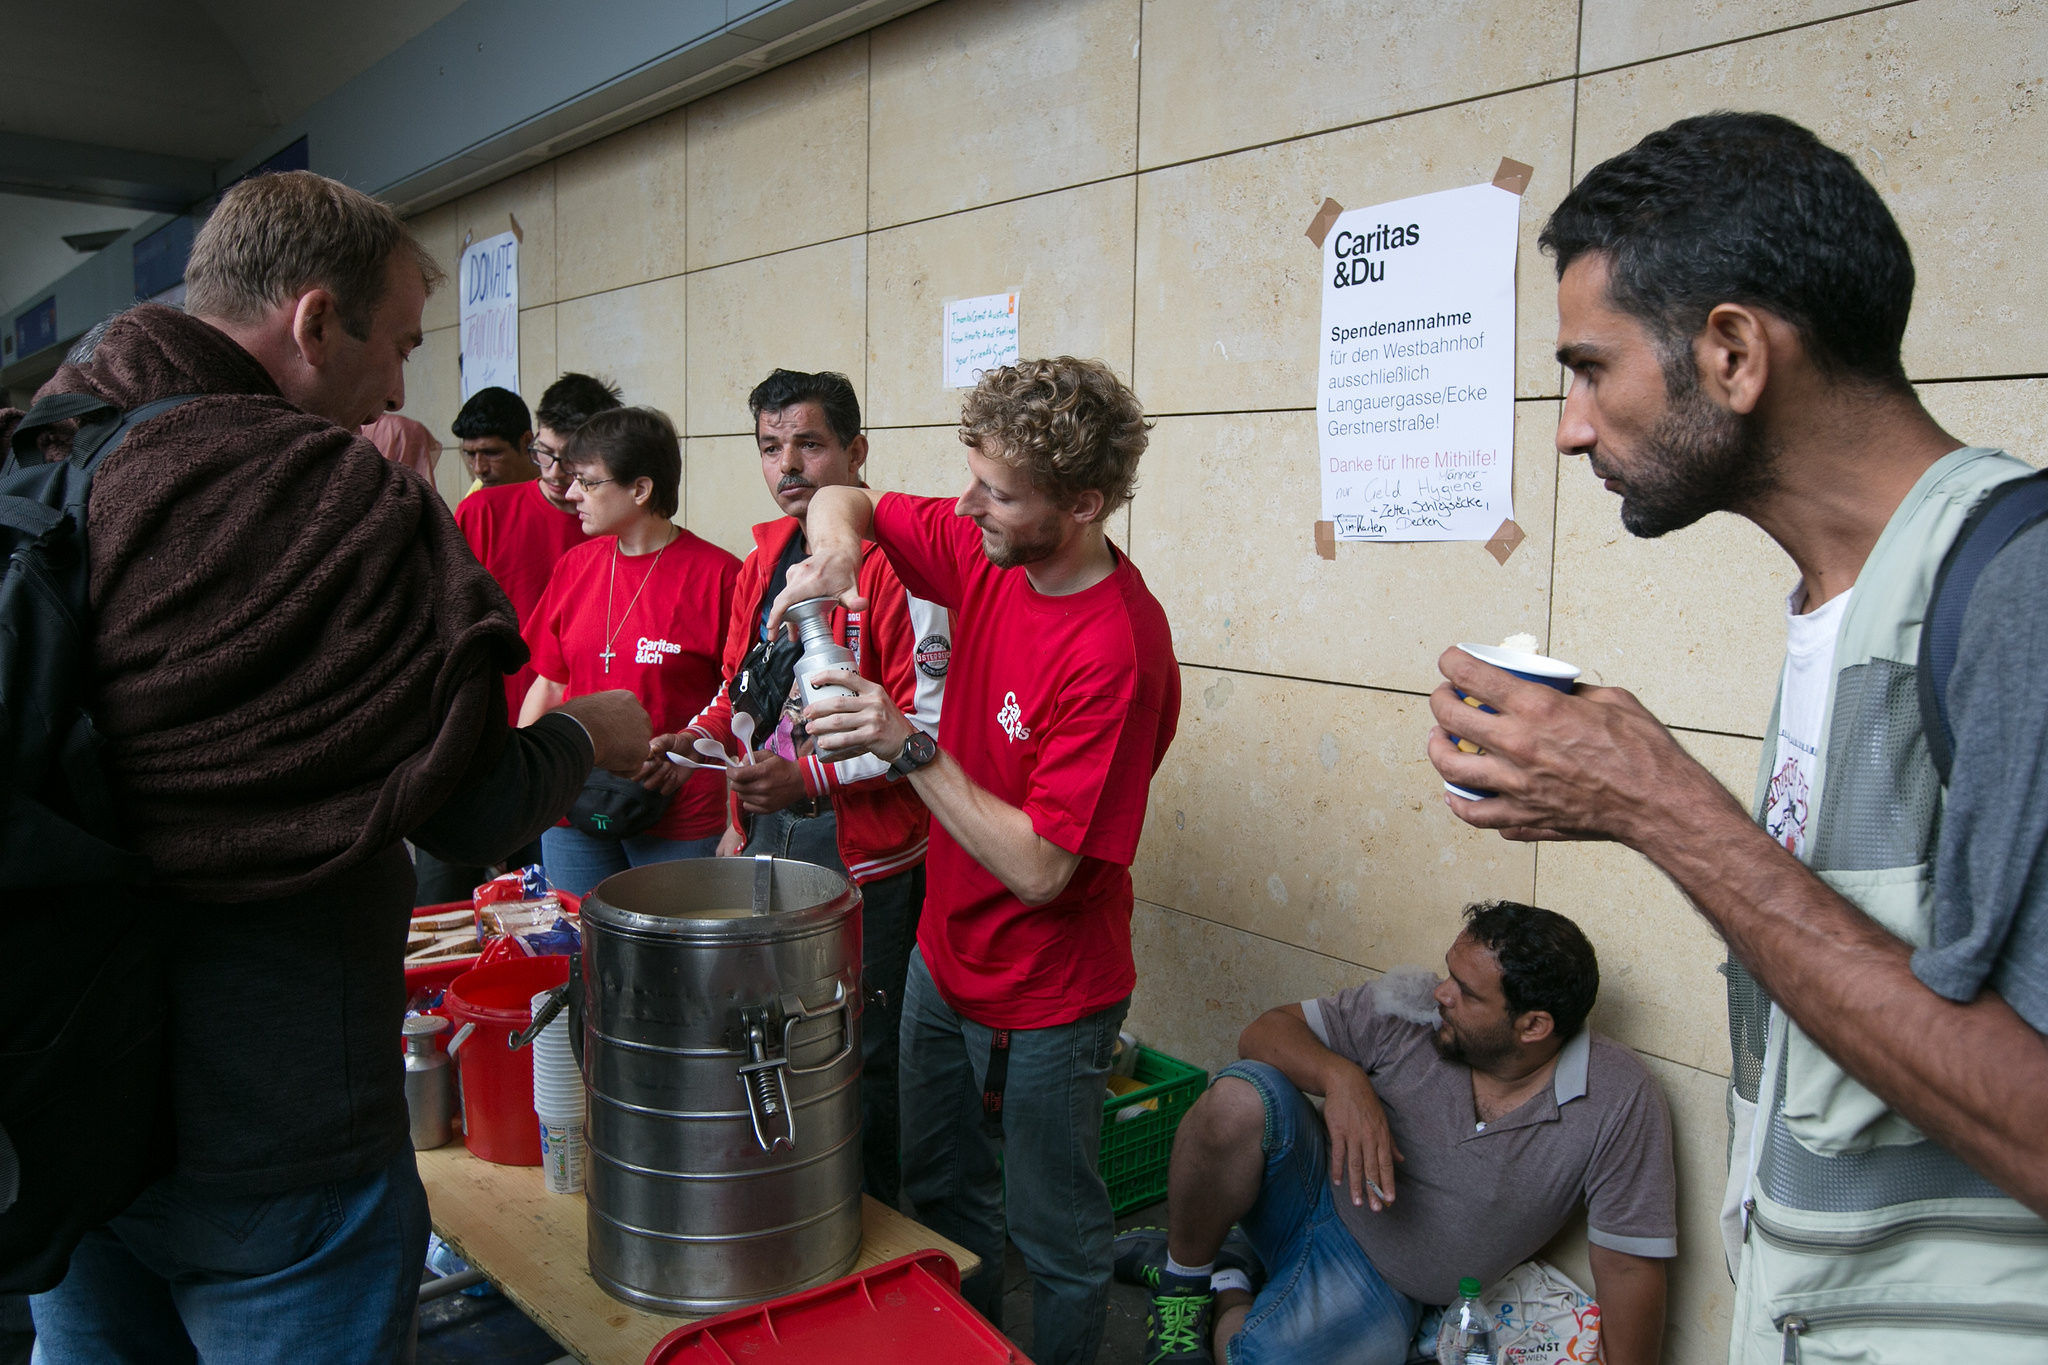 Austrian decision not to sign migration framework 'harmful' says Caritas